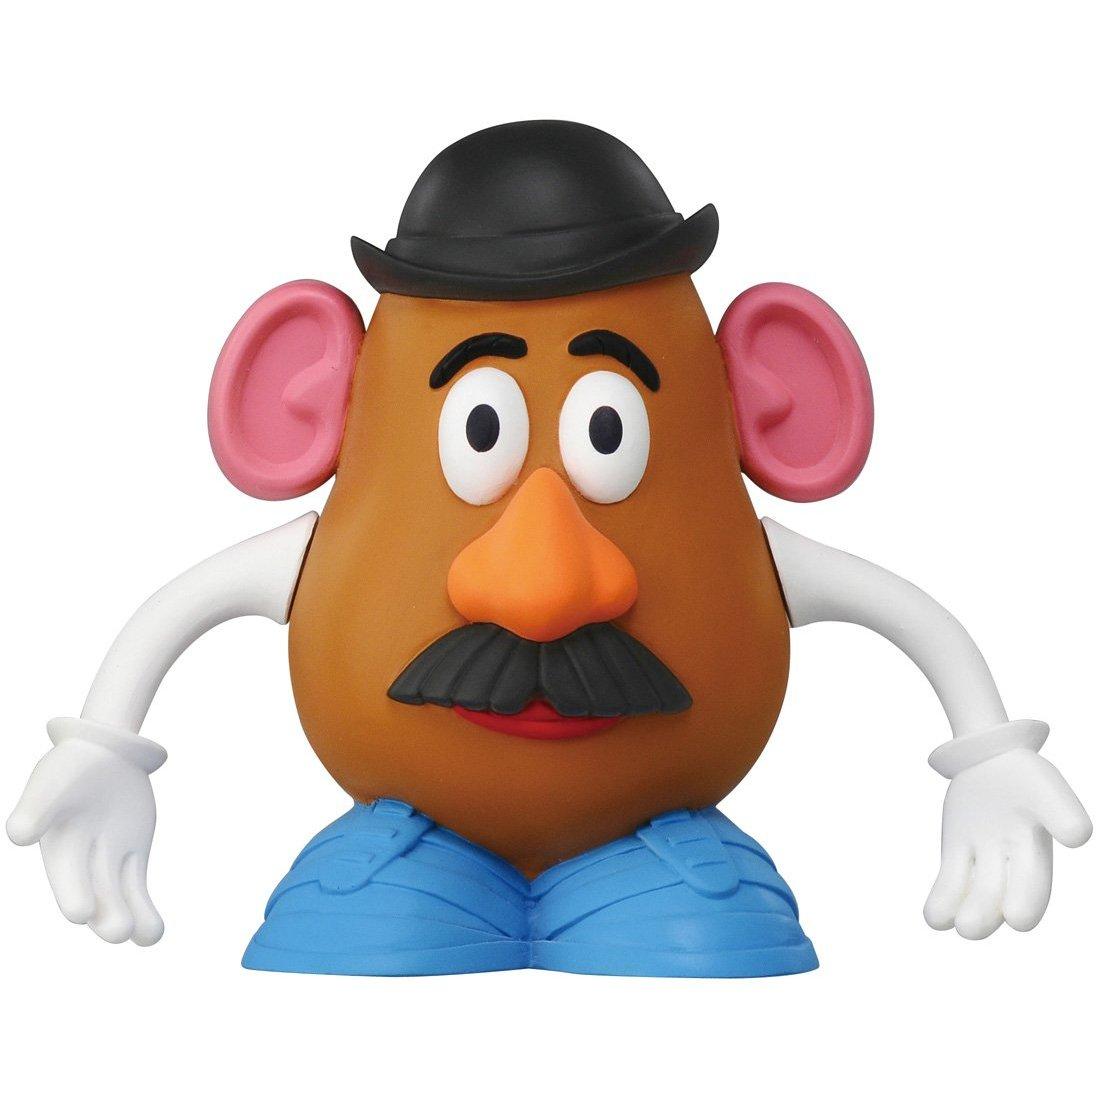 Mr Potato Head Clipart-Mr Potato Head Clipart-8